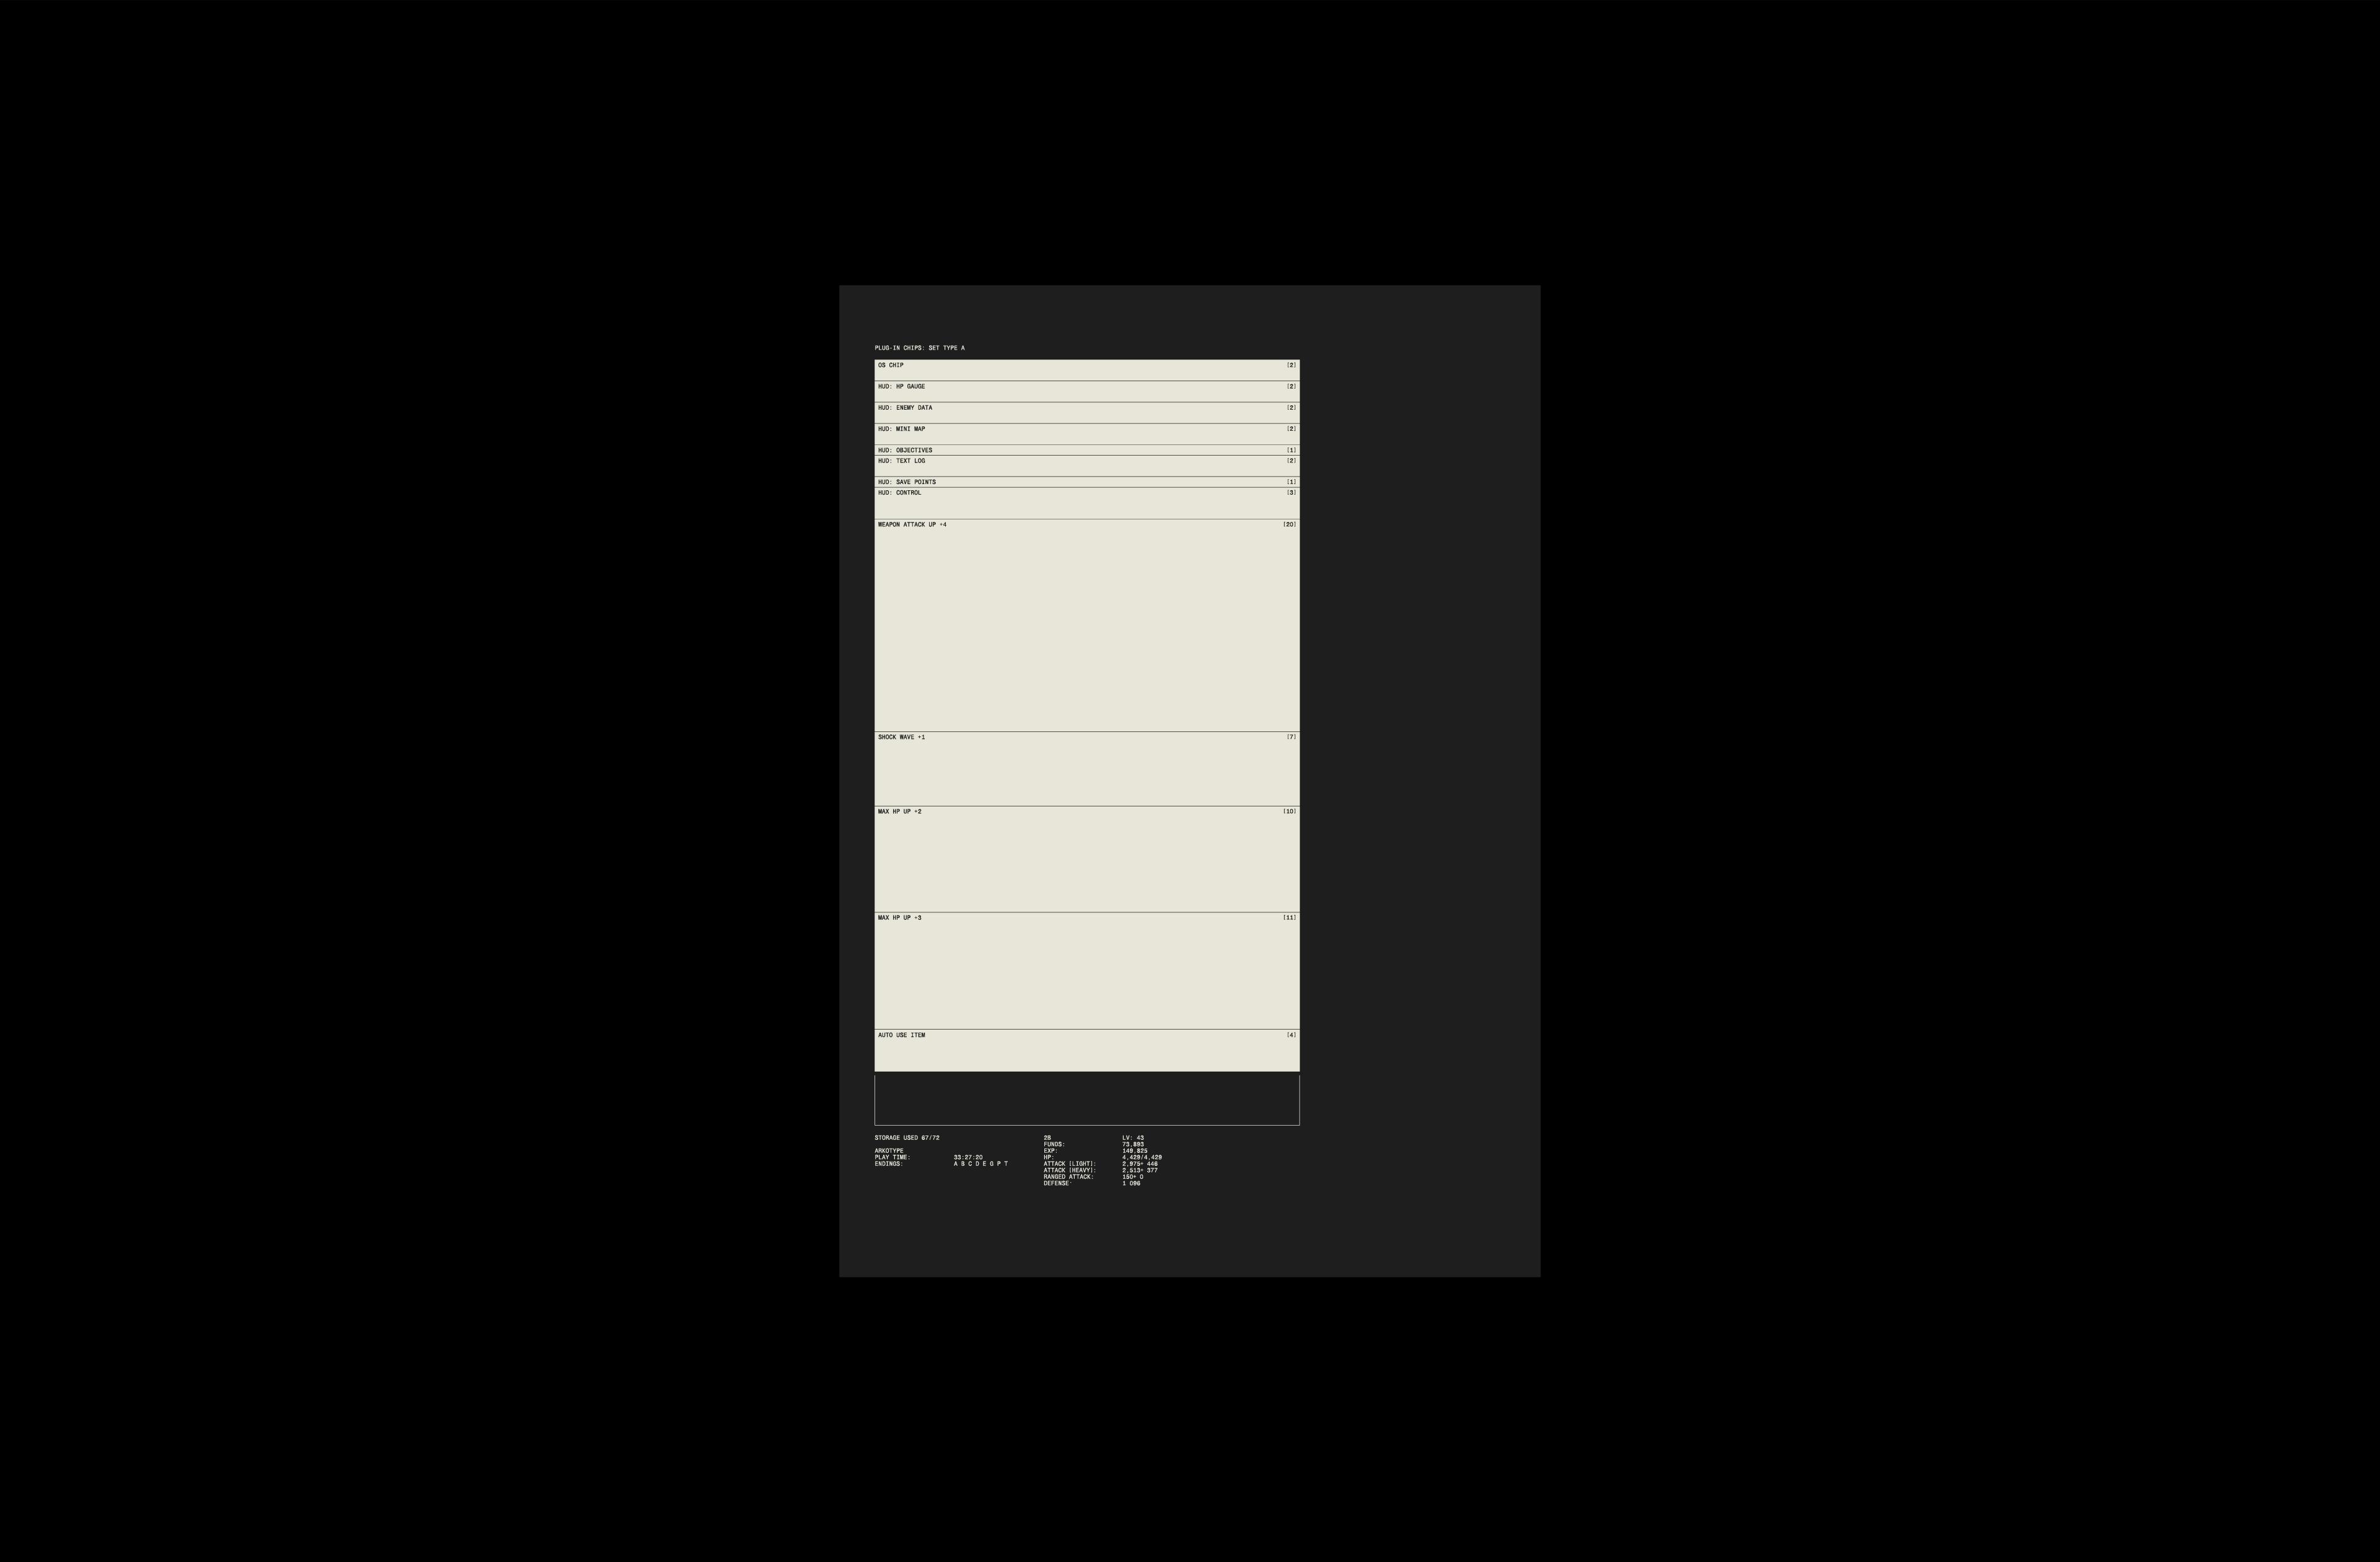 NIER-print-2x